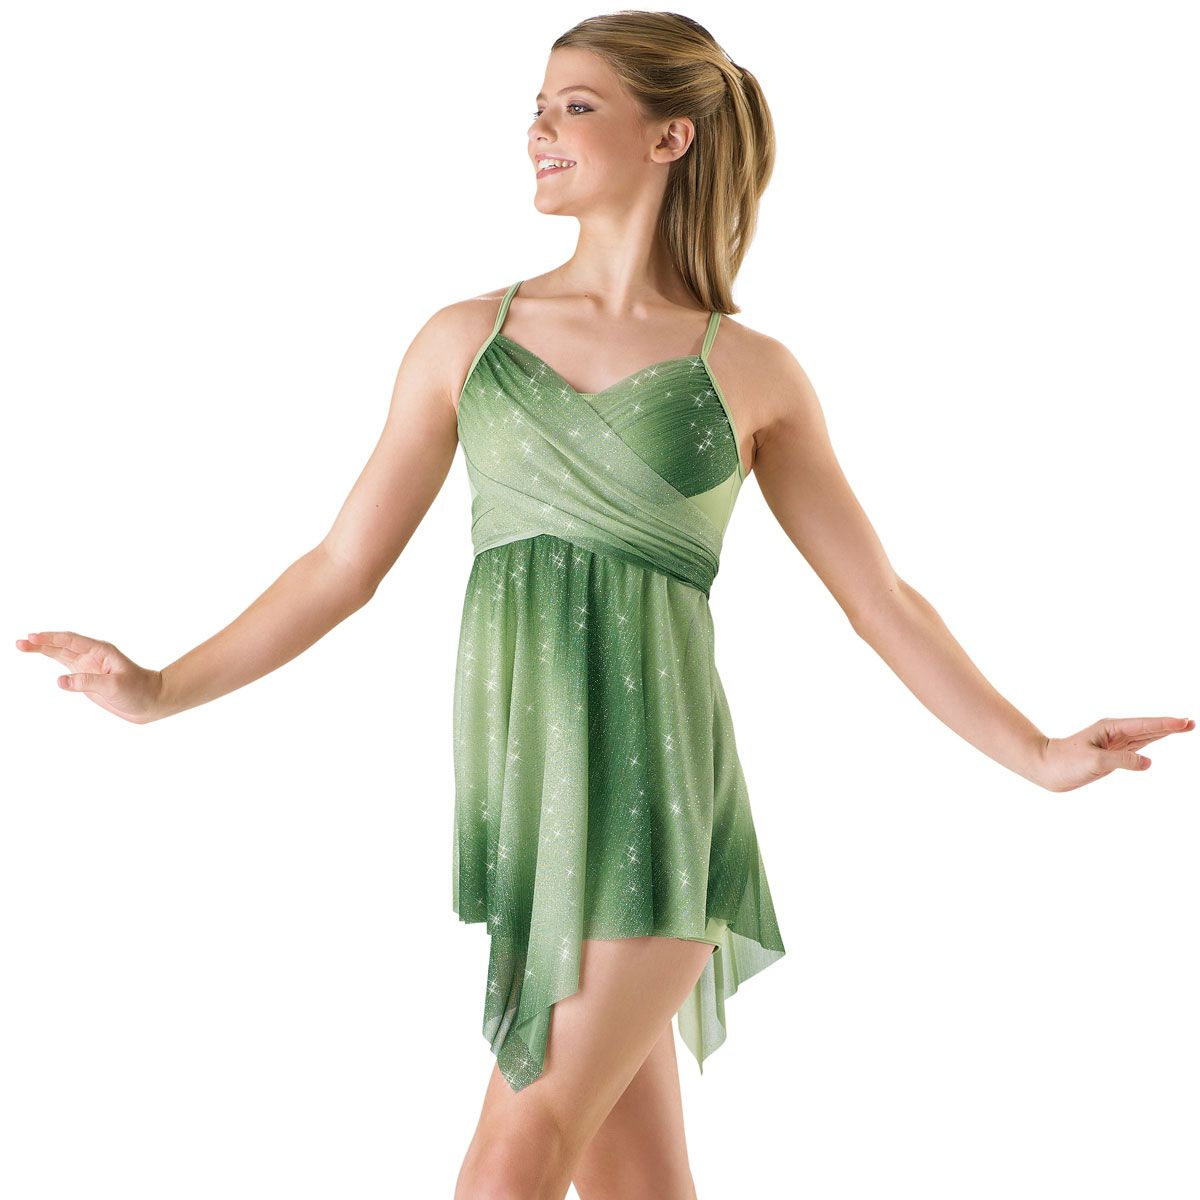 Lyrical dance dress cheap